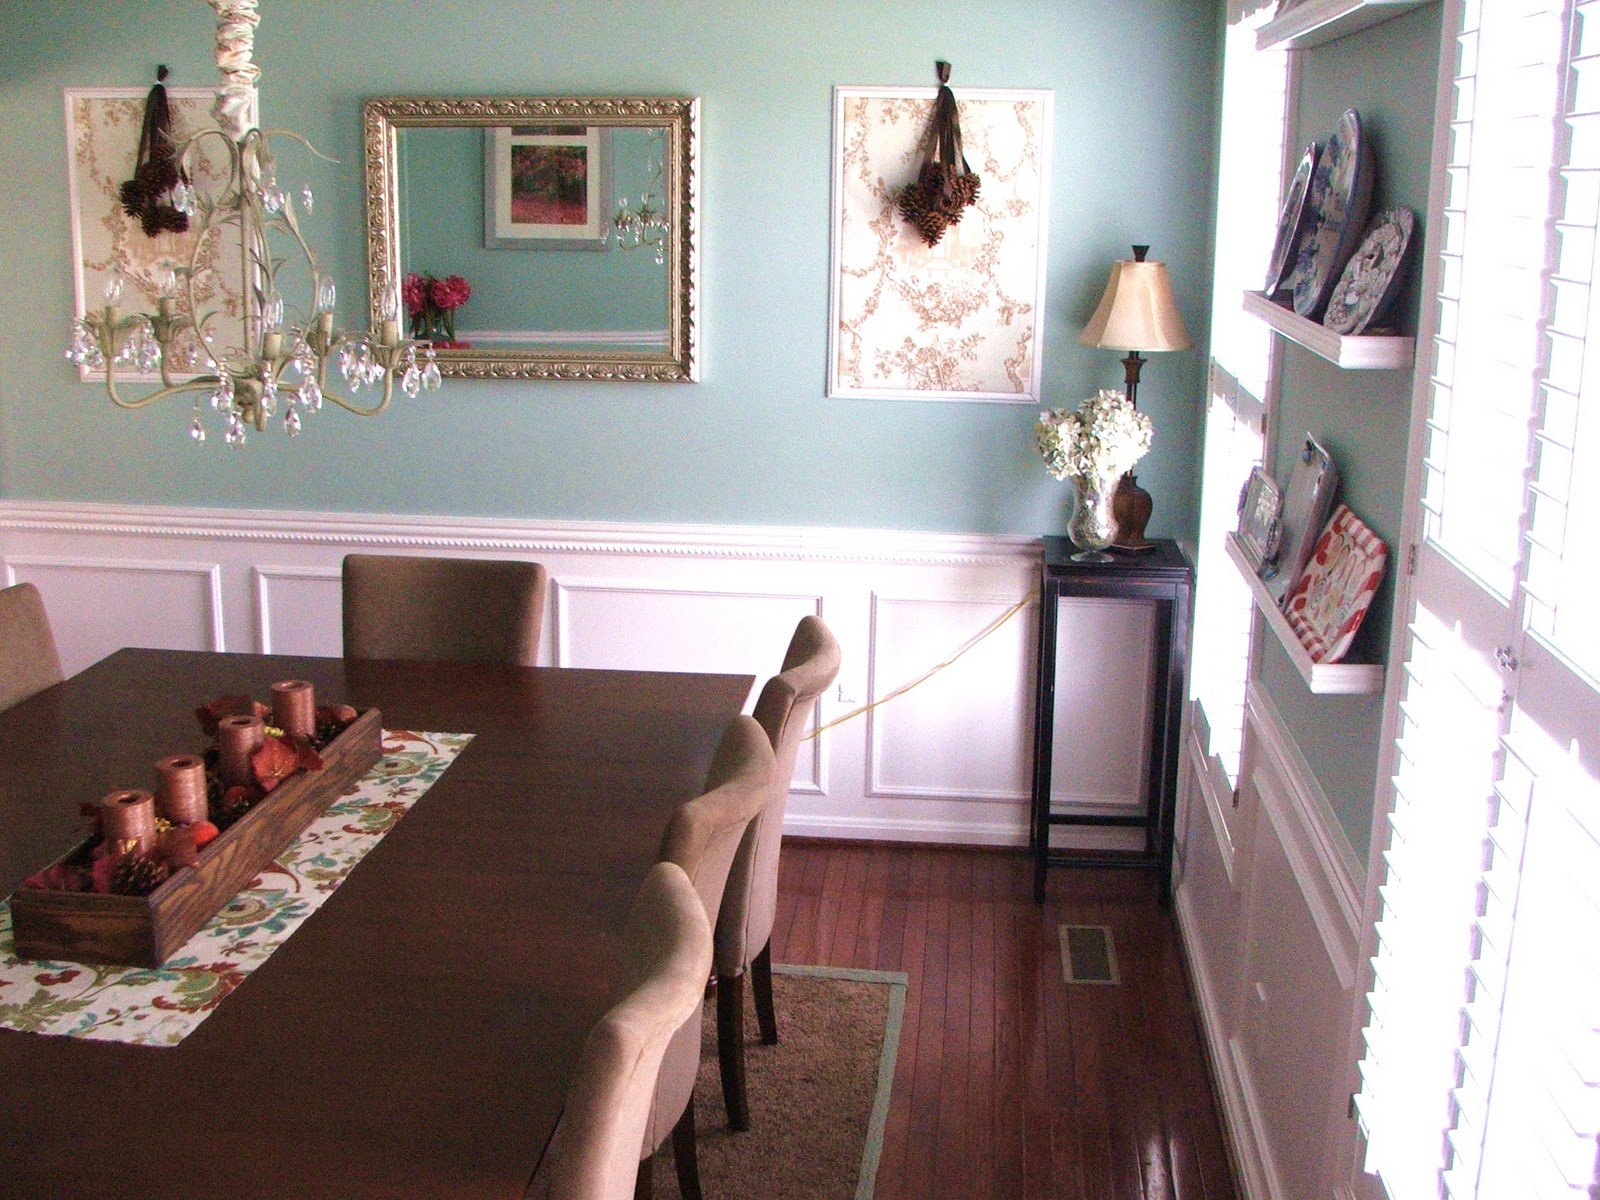 Diy wainscoting dining room - Diy Wainscoting Dining Room